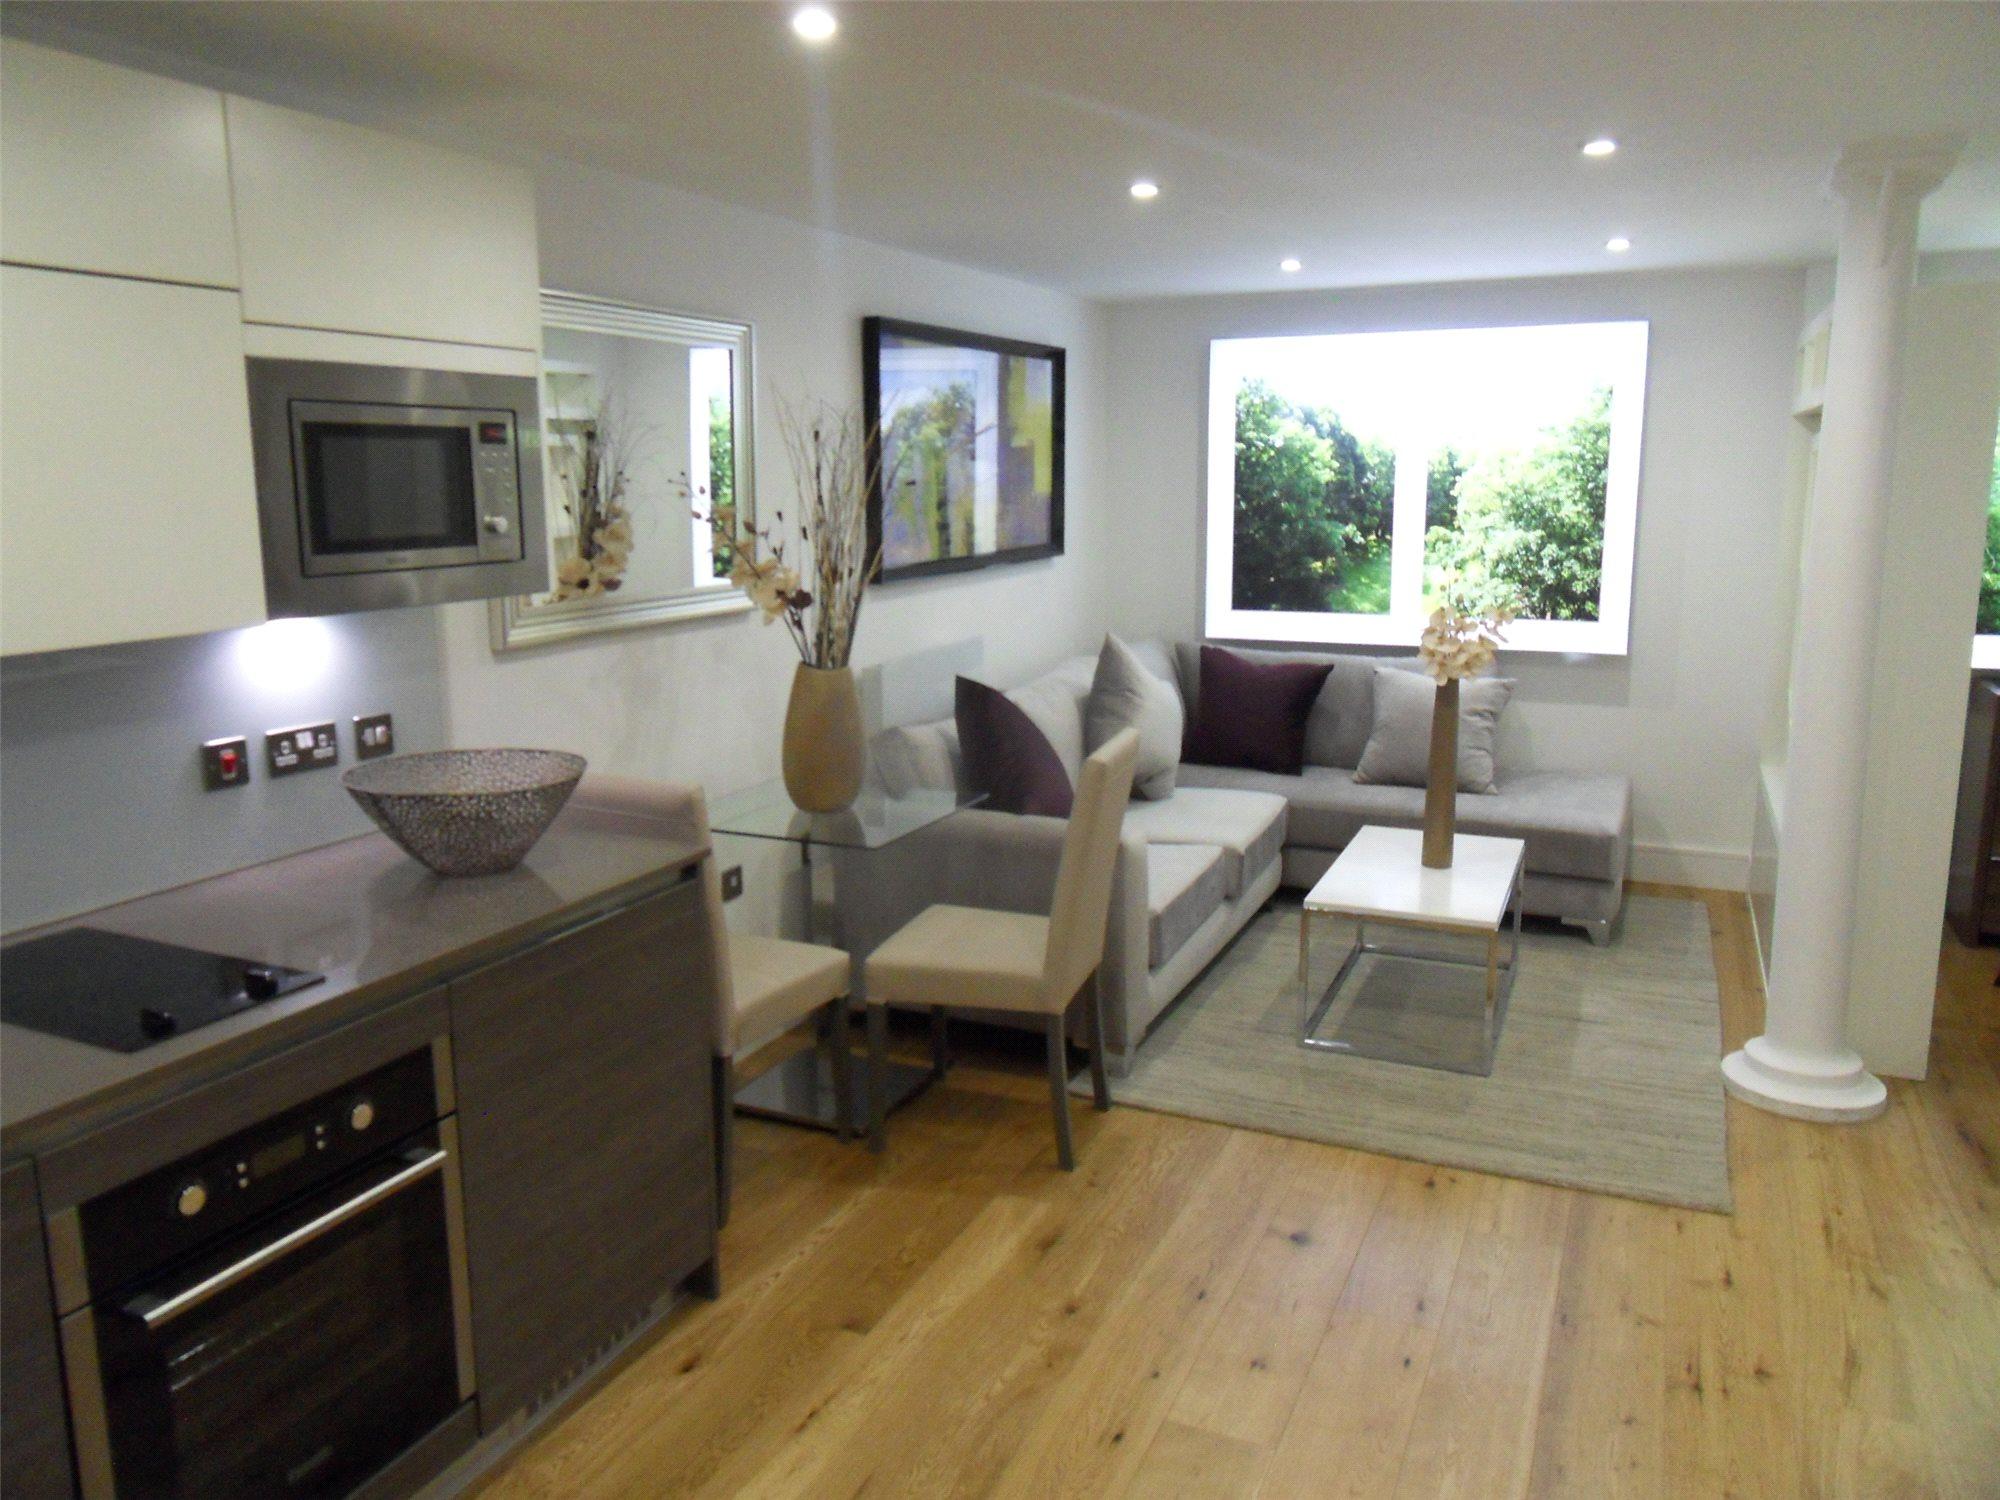 Riverdale House, Molesworth Street, Lewisham, SE13